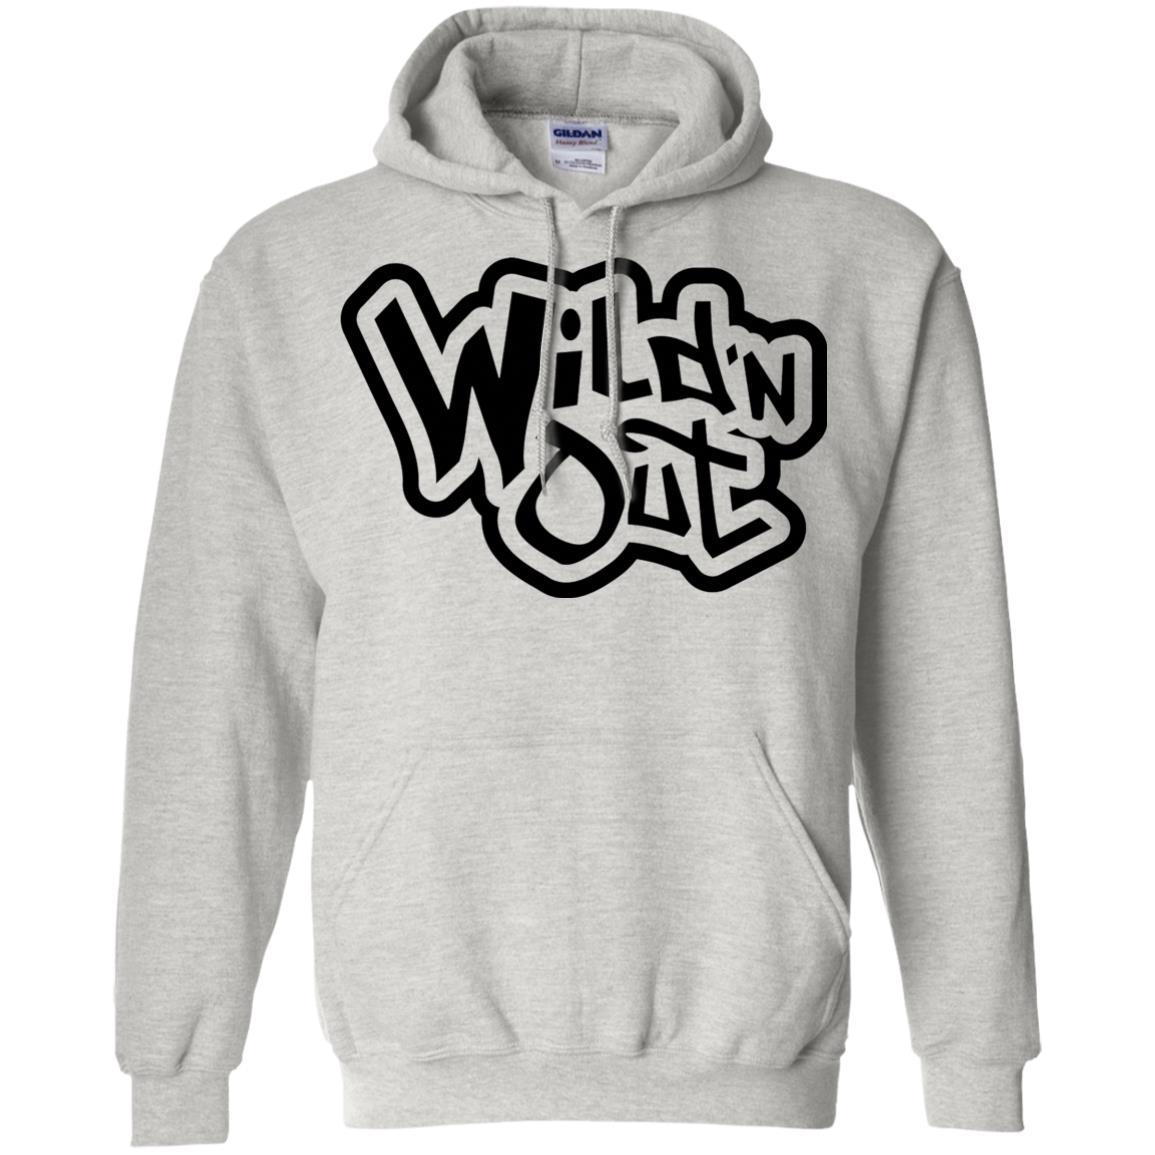 72b8c3396 Wild N Out T Shirt - 10% Off - FavorMerch